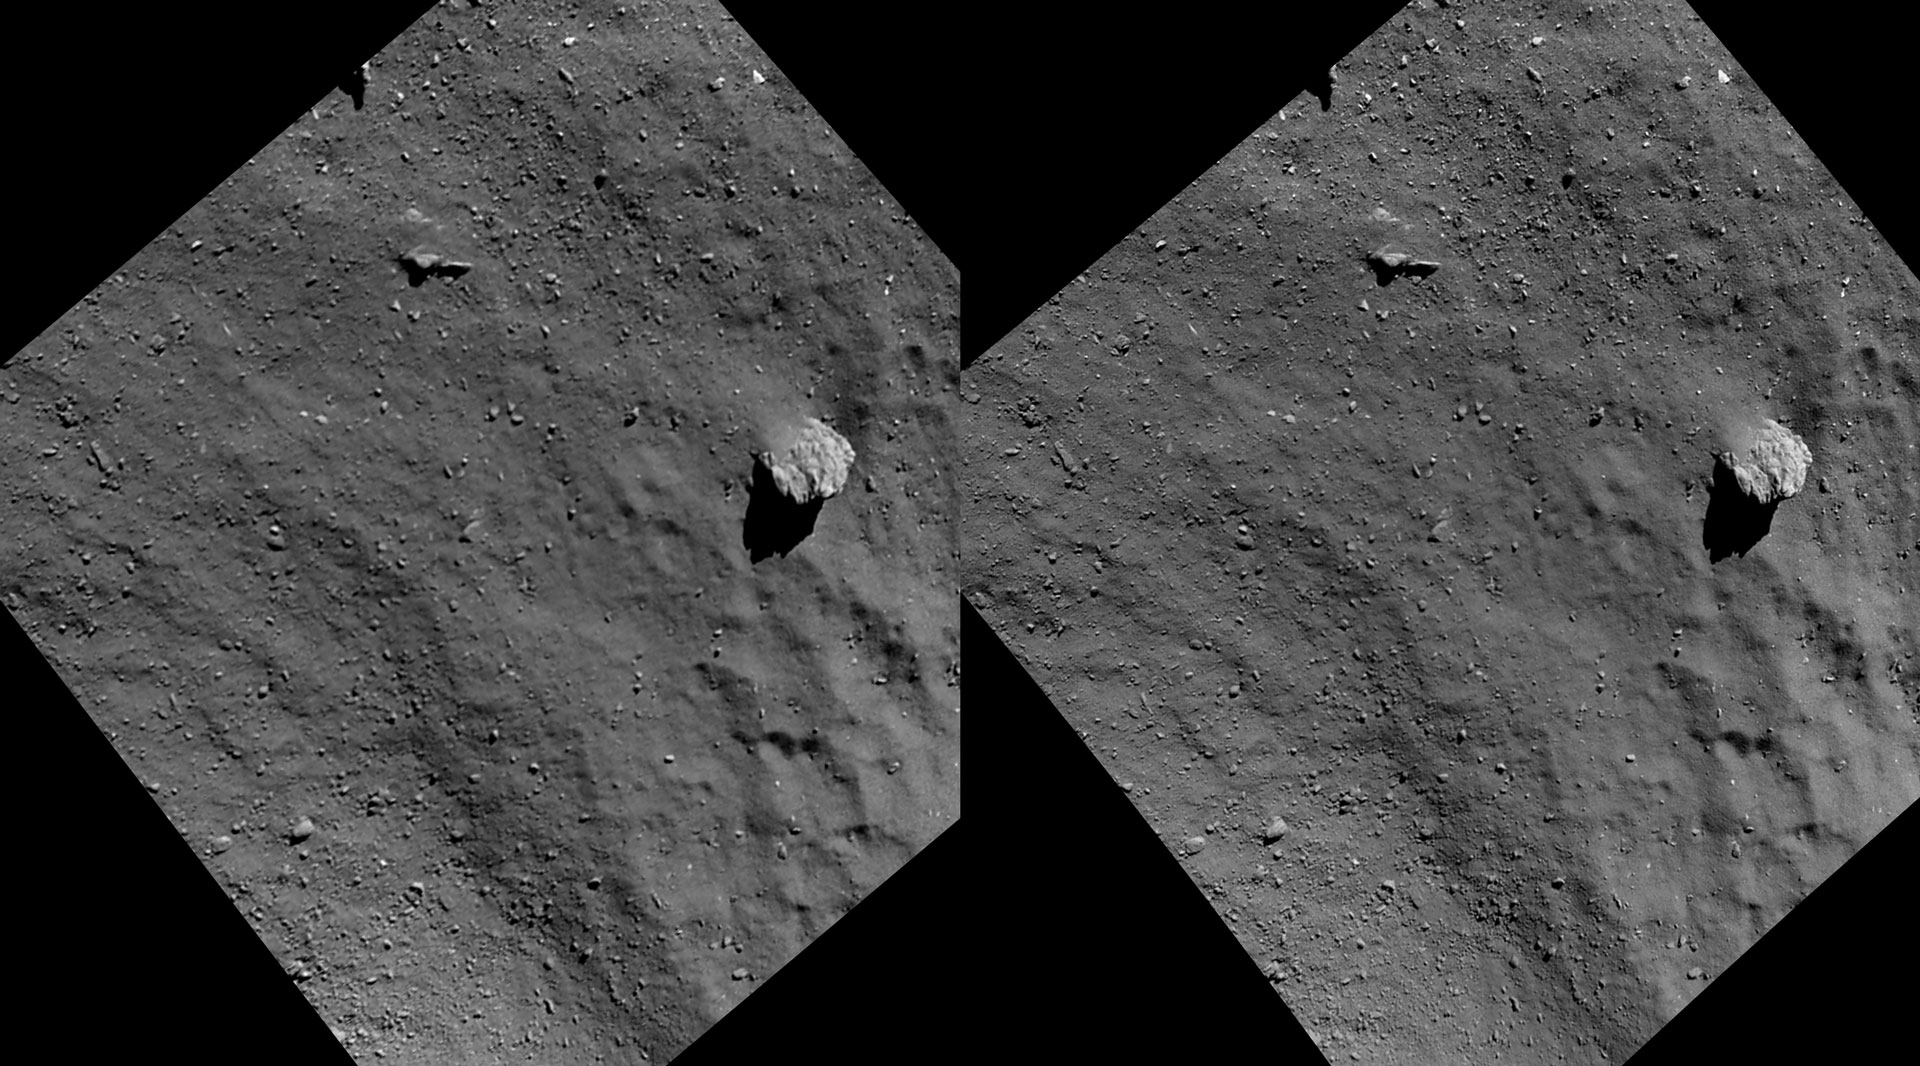 Comet 67P/Churyumov-Gerasimenko, комета, космос, астрономия, 3D, перекрёстная стереопара, стерео, стереопара, 2015